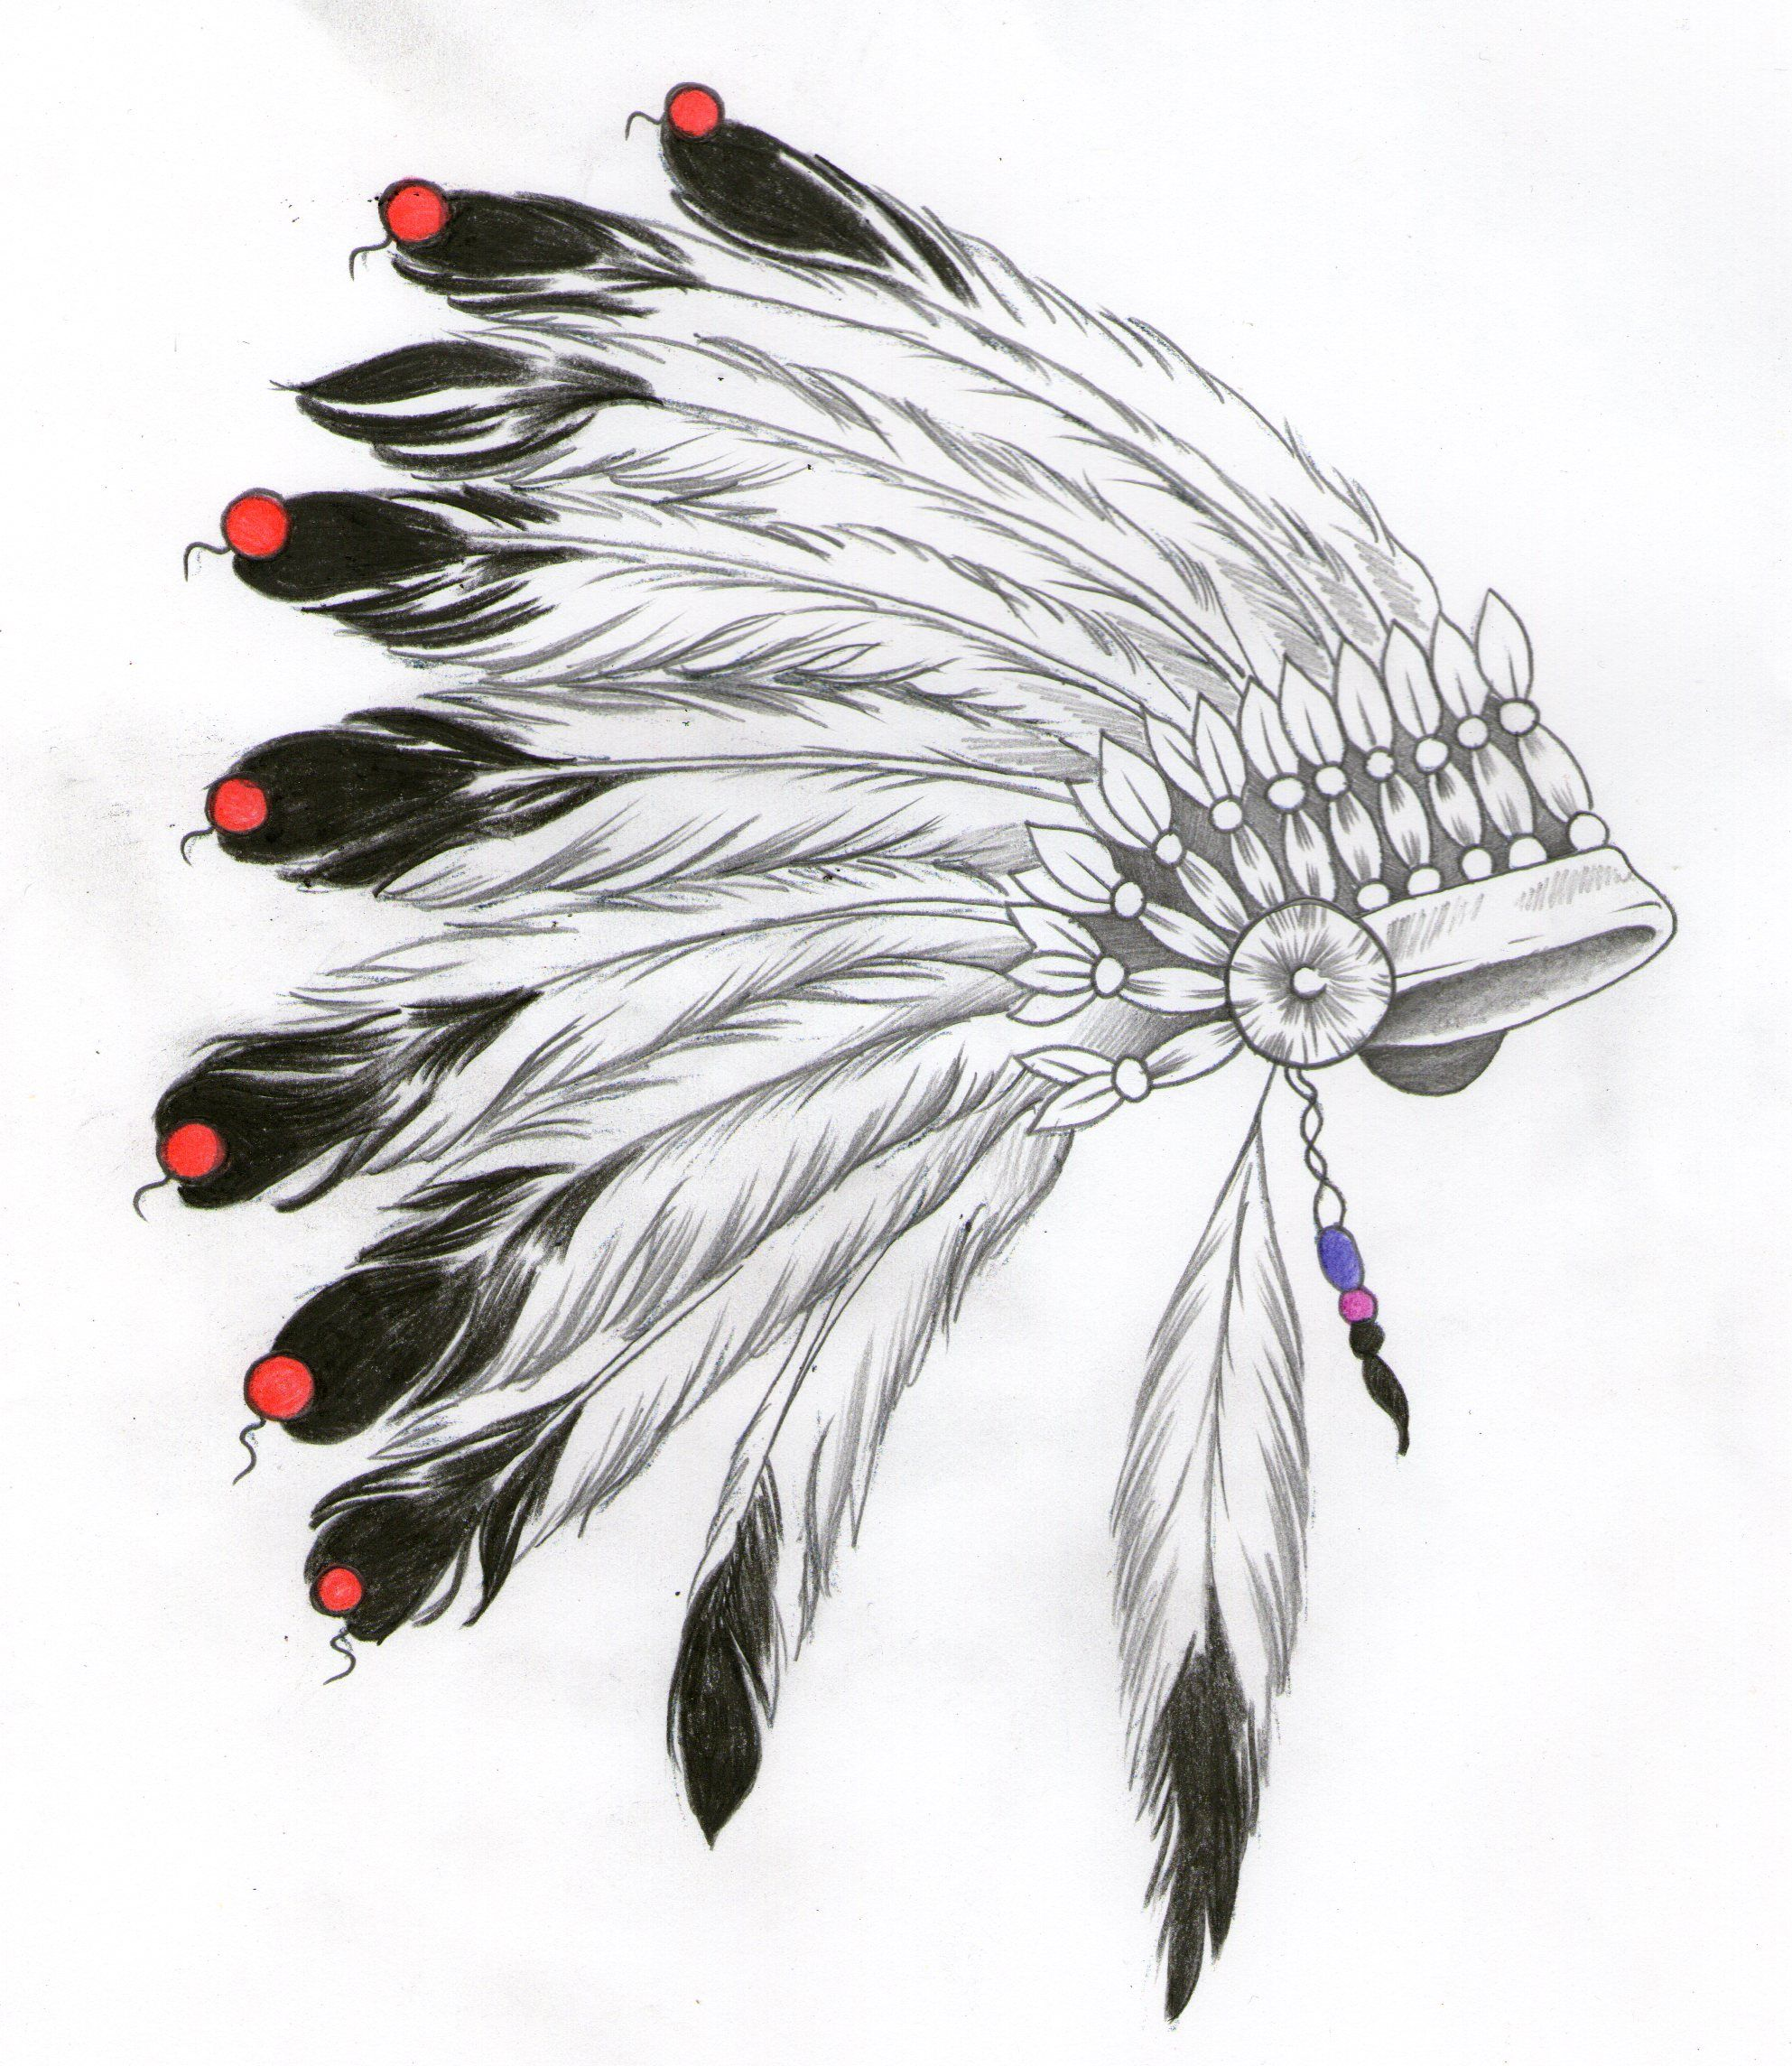 indian headdress design   T.Hat   Pinterest   Tatuajes, Indio y ...